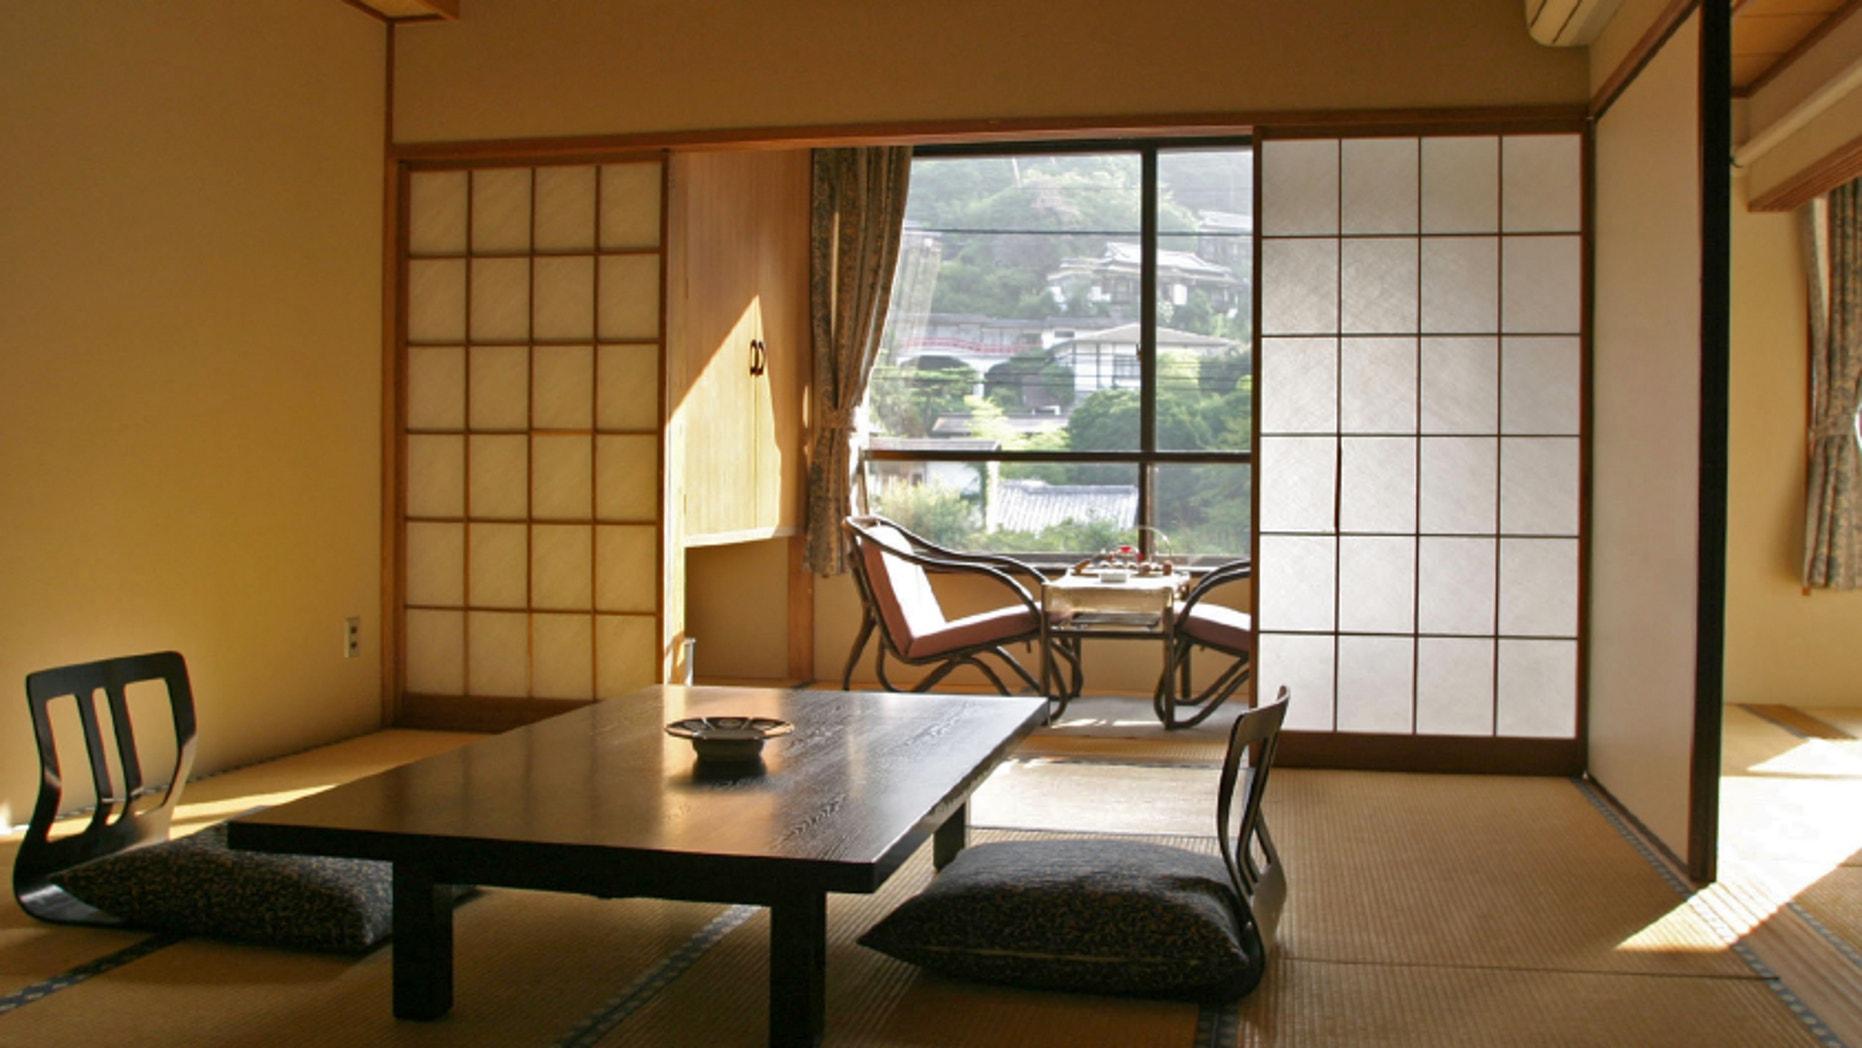 Room divider screens